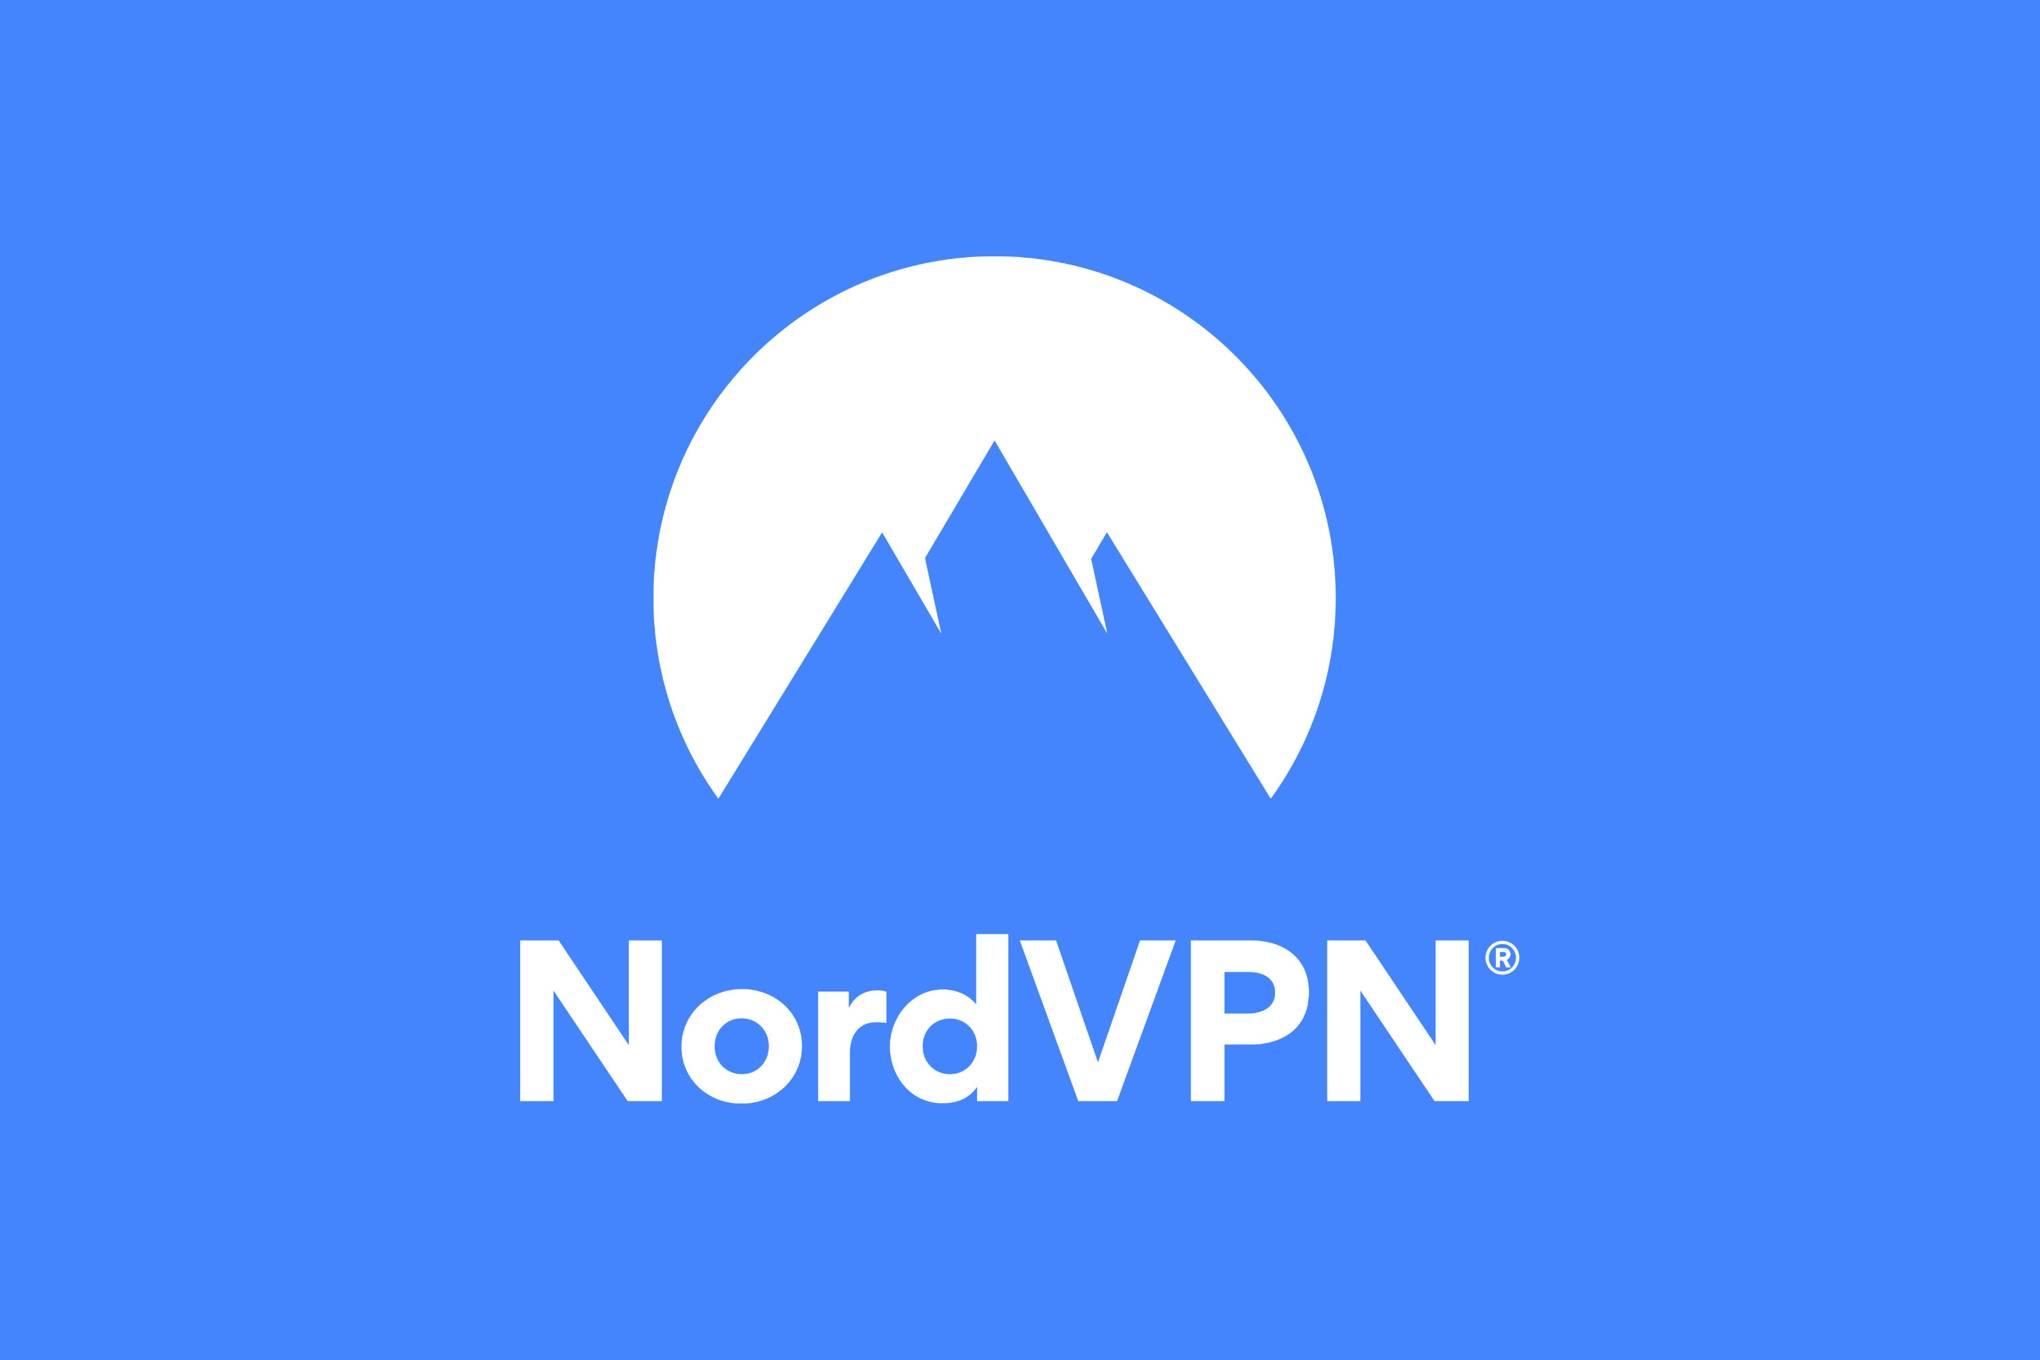 Nord VPN App Review